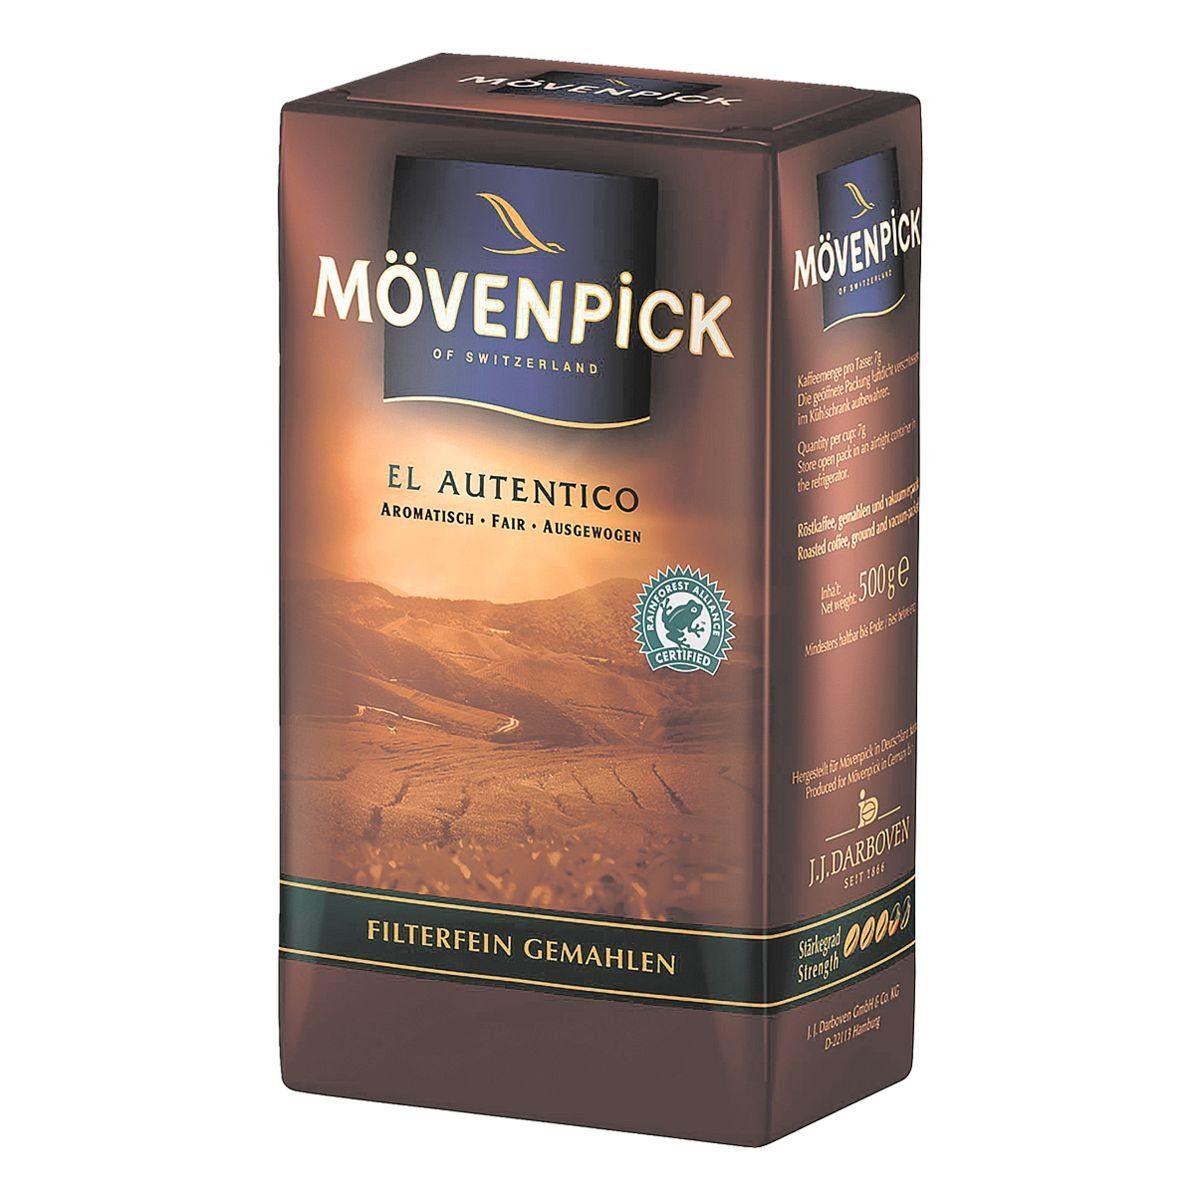 MOEVENPICK Kaffee - gemahlen »El Autentico«